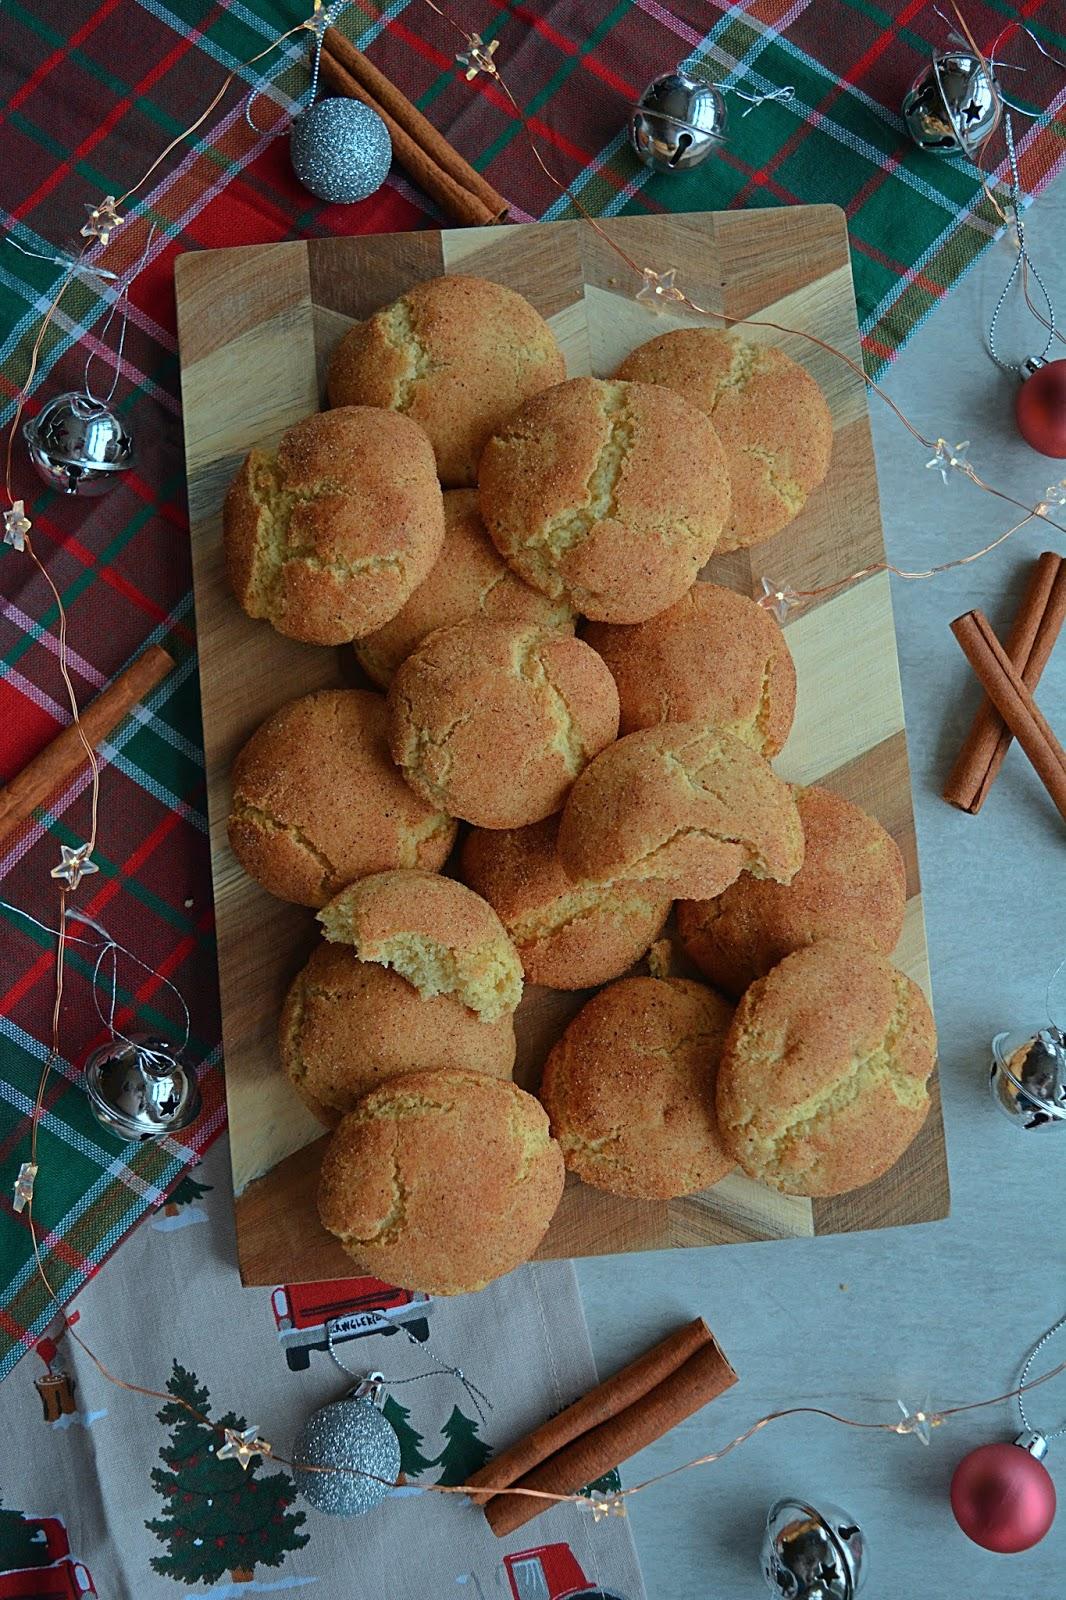 cinnamon, cookies, Christmas, baking, Christmas baking, snickerdoodle